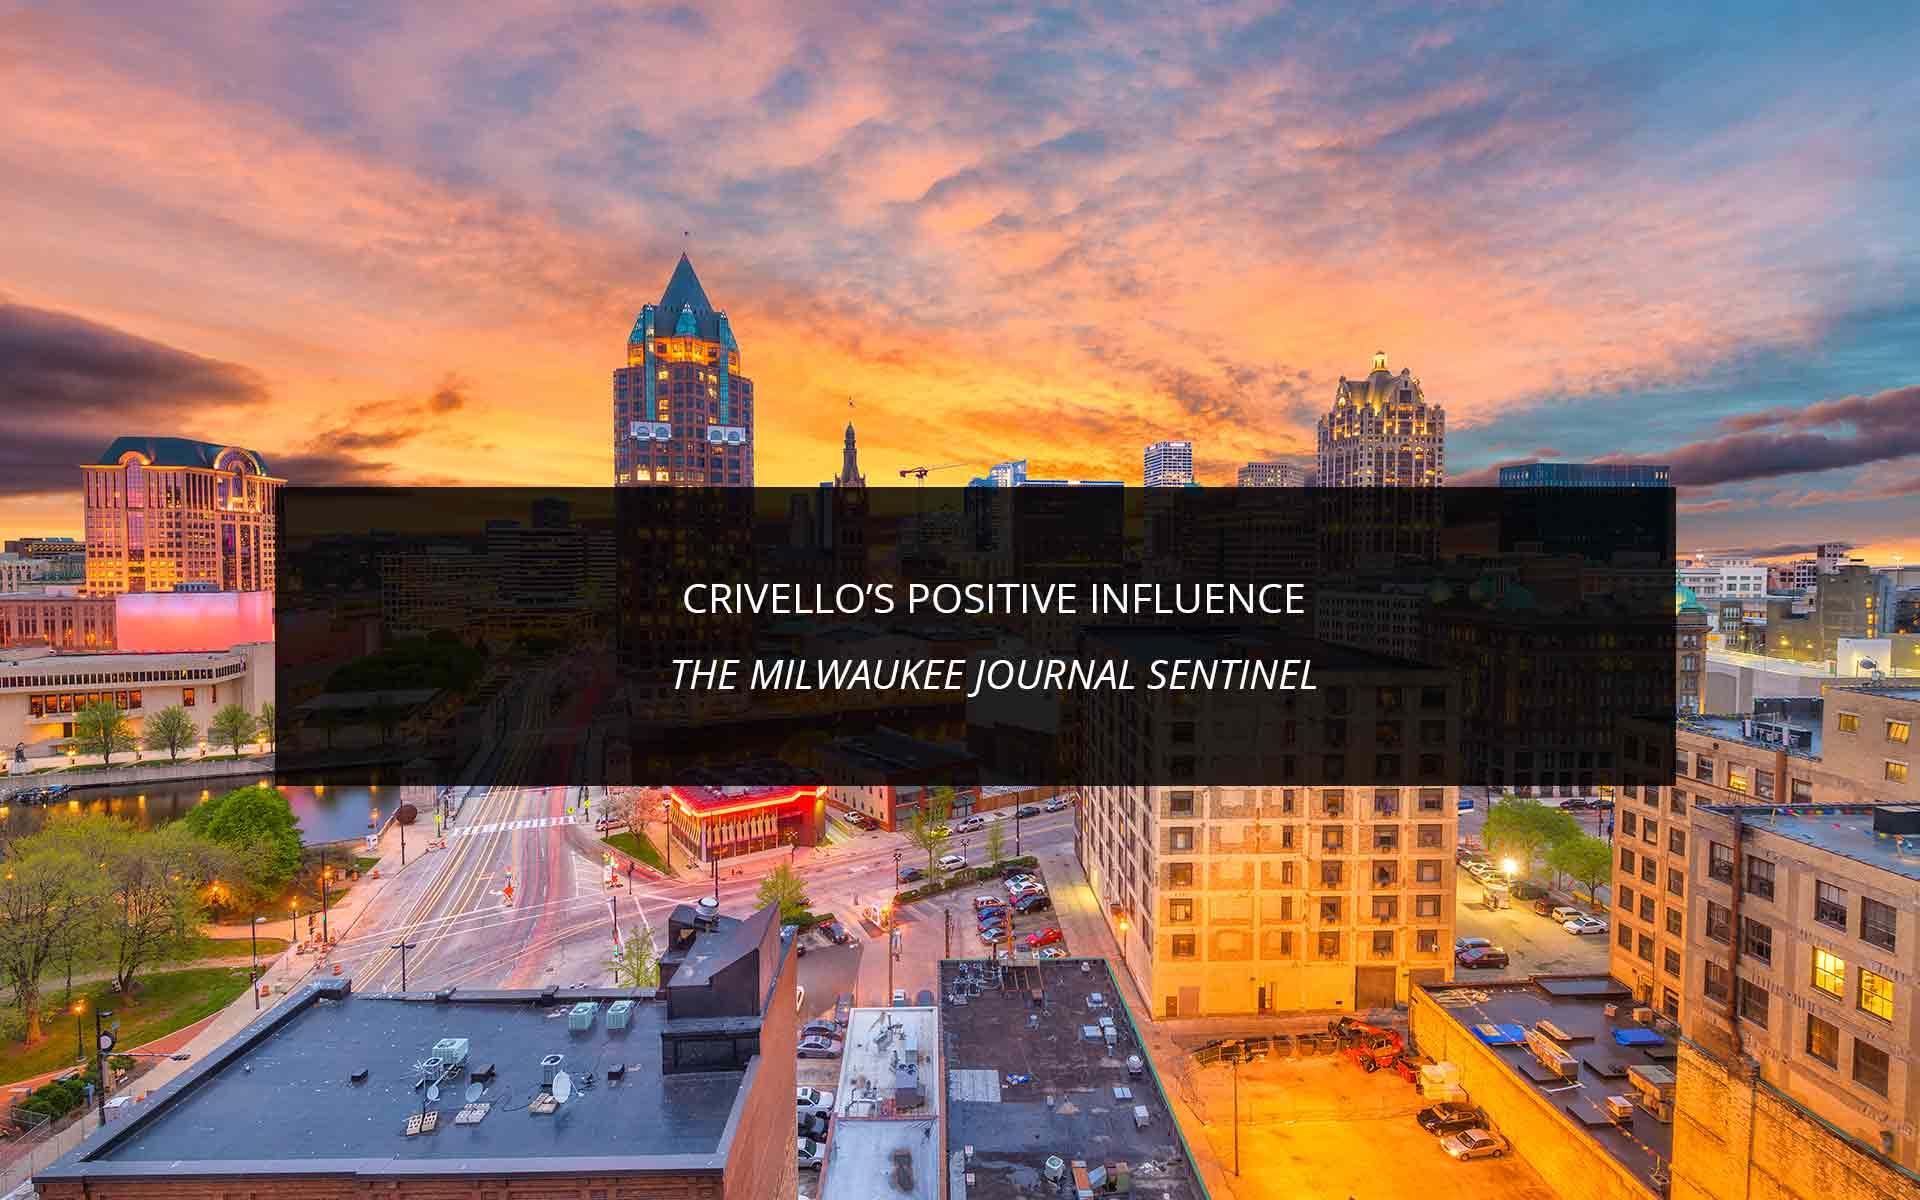 Crivello's Positive Influence